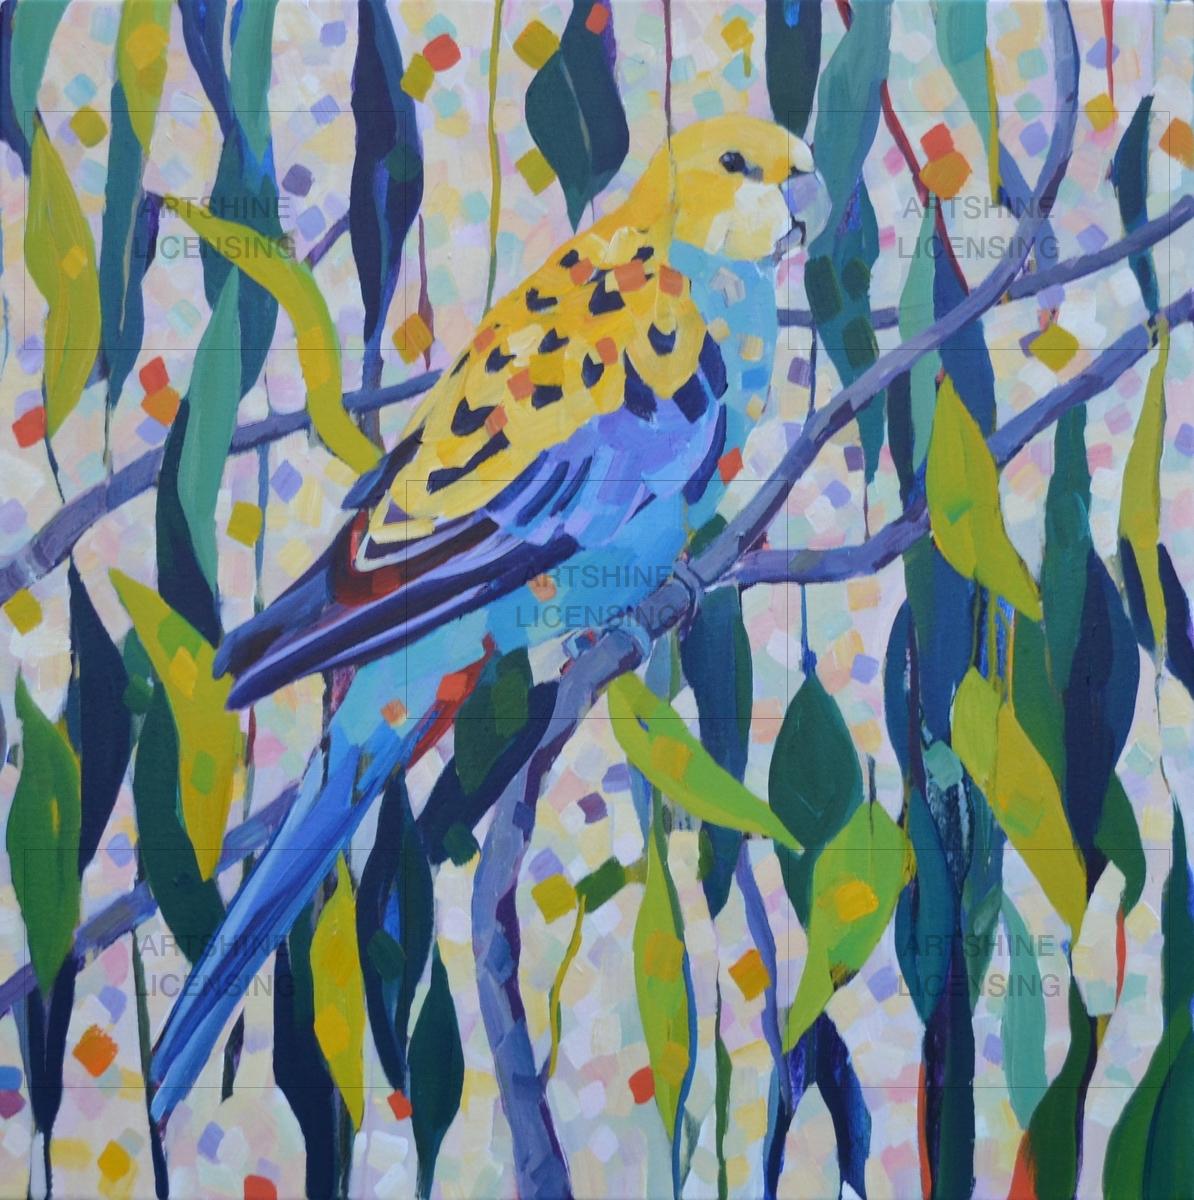 Pale Headed Parrot